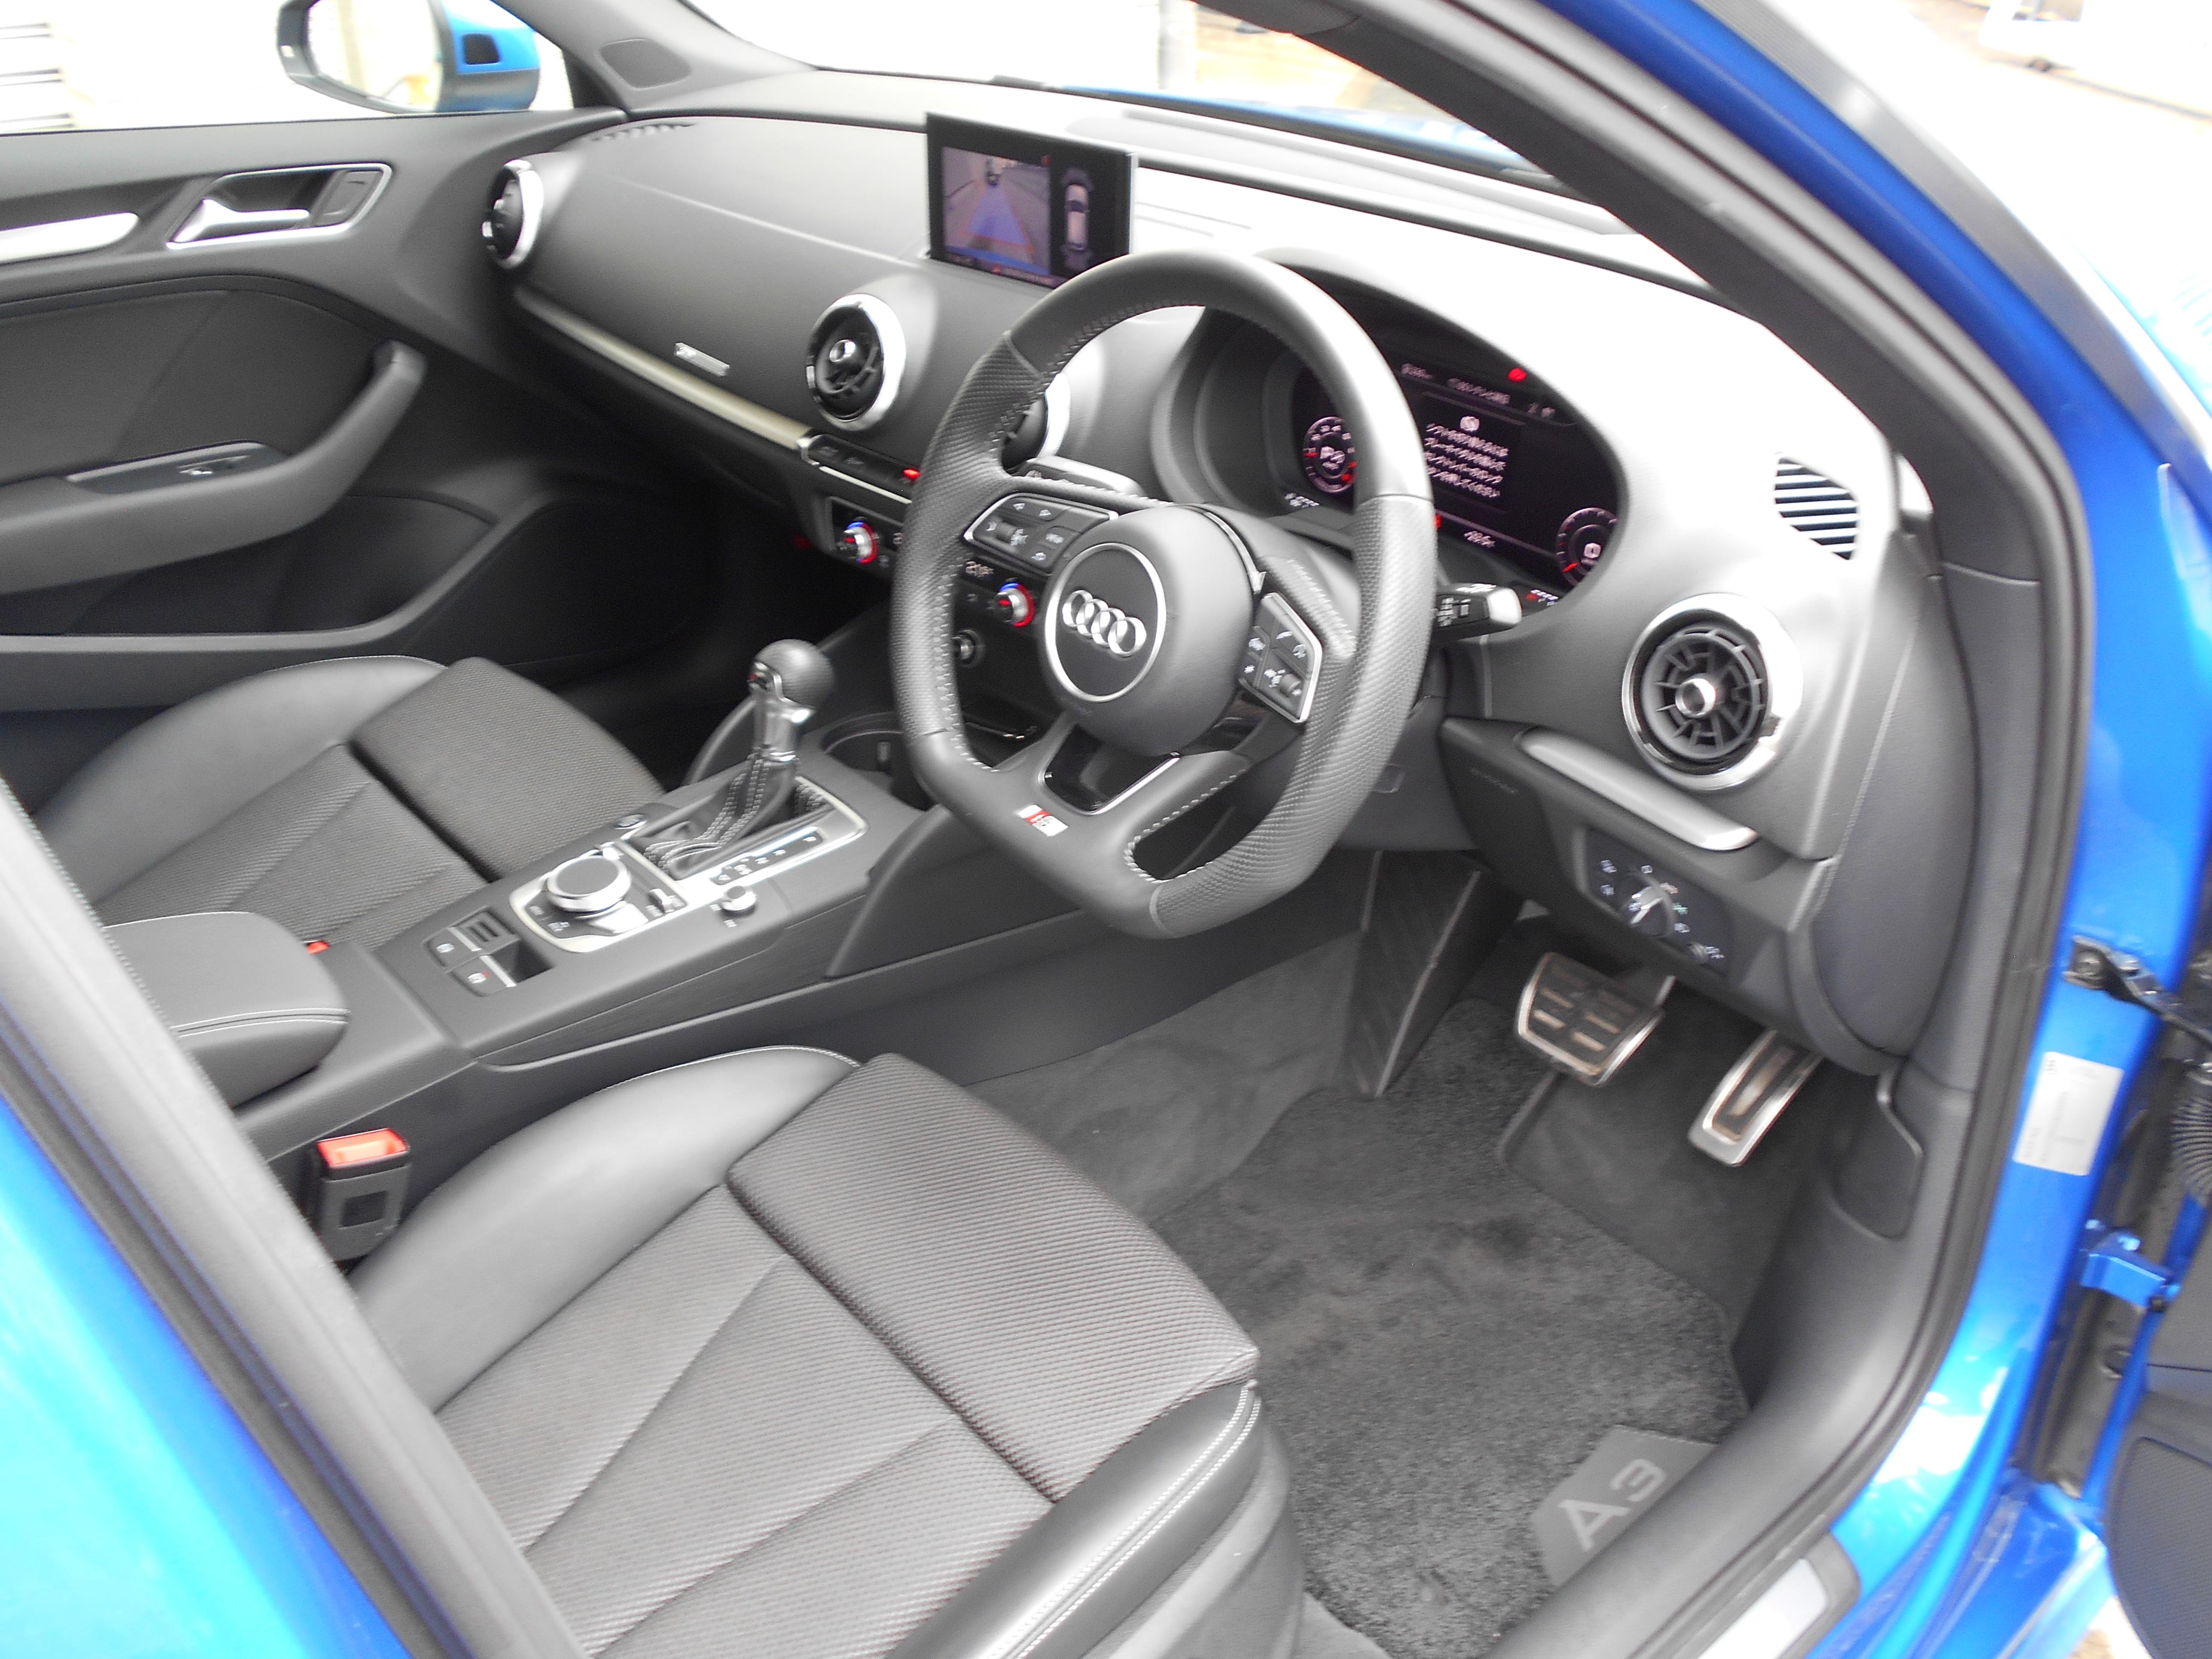 Audi A3 スポーツB 1.4TFSI スポーツ Sライン